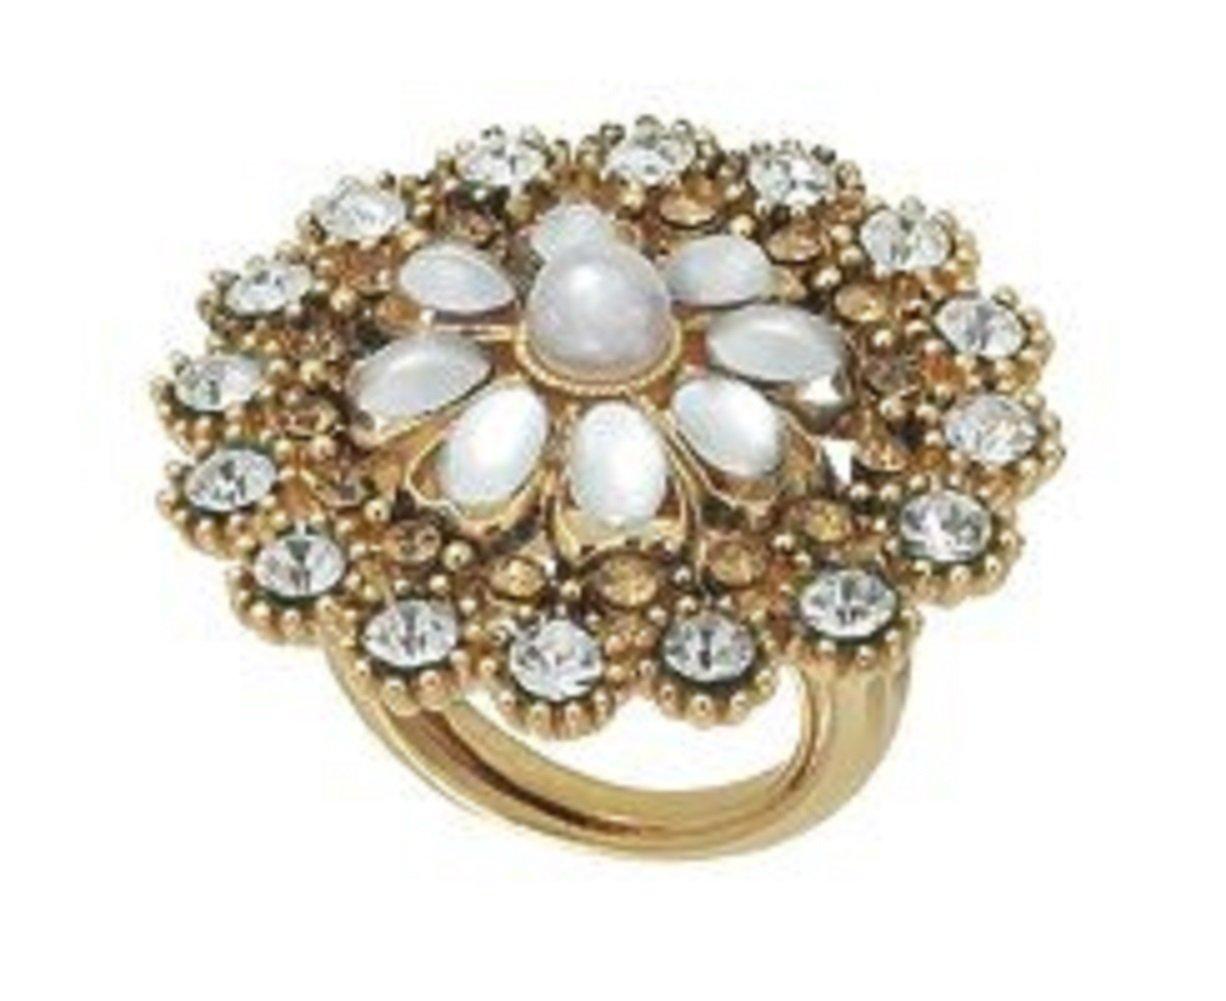 Vintage Treasures Flower Adjustable Ring with Crystals